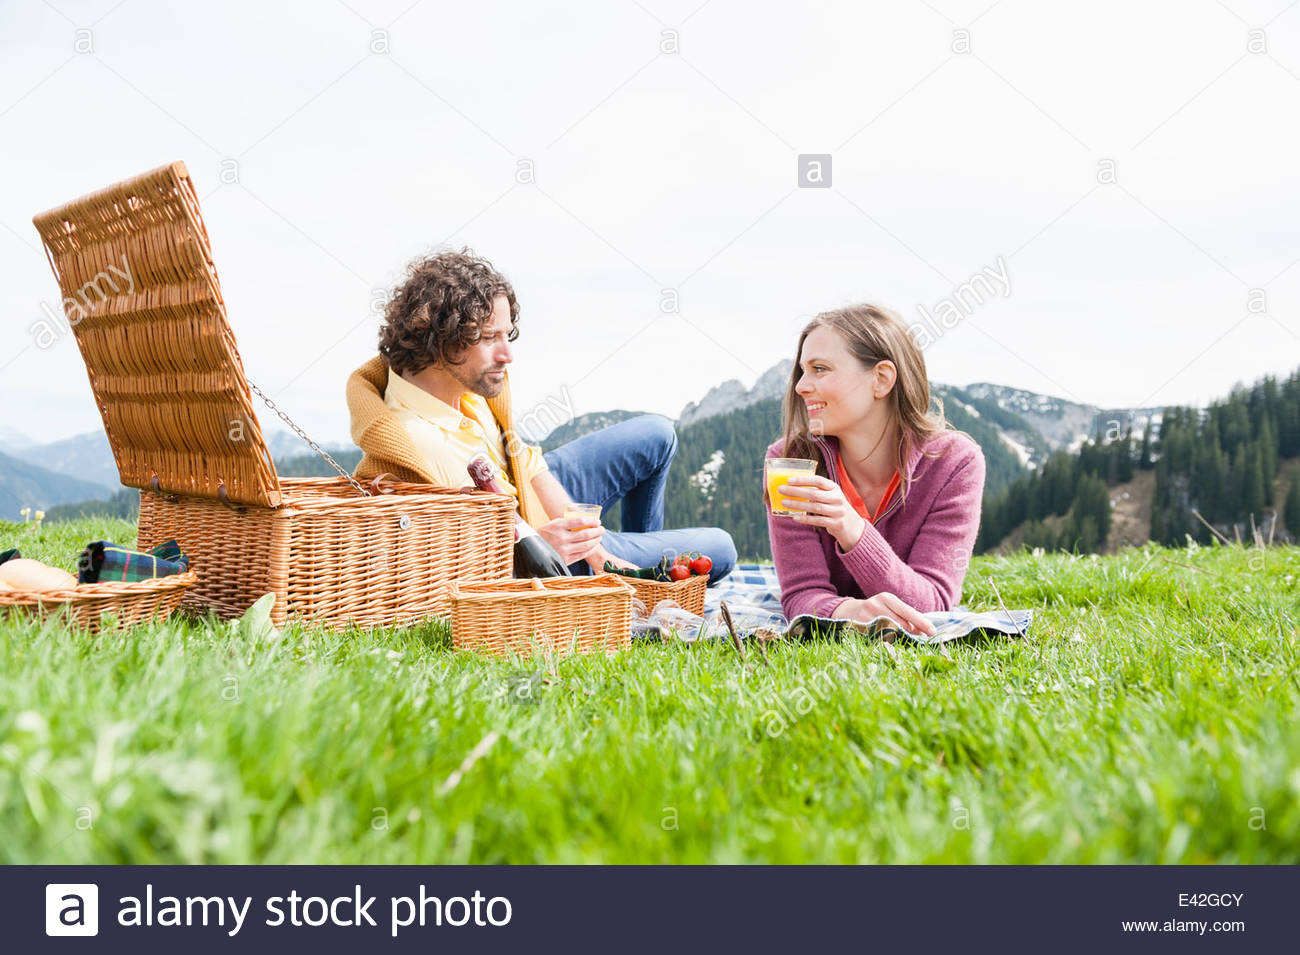 Couple enjoying picnic, Wallberg, Tegernsee, Bavière, Allemagne Banque D'Images